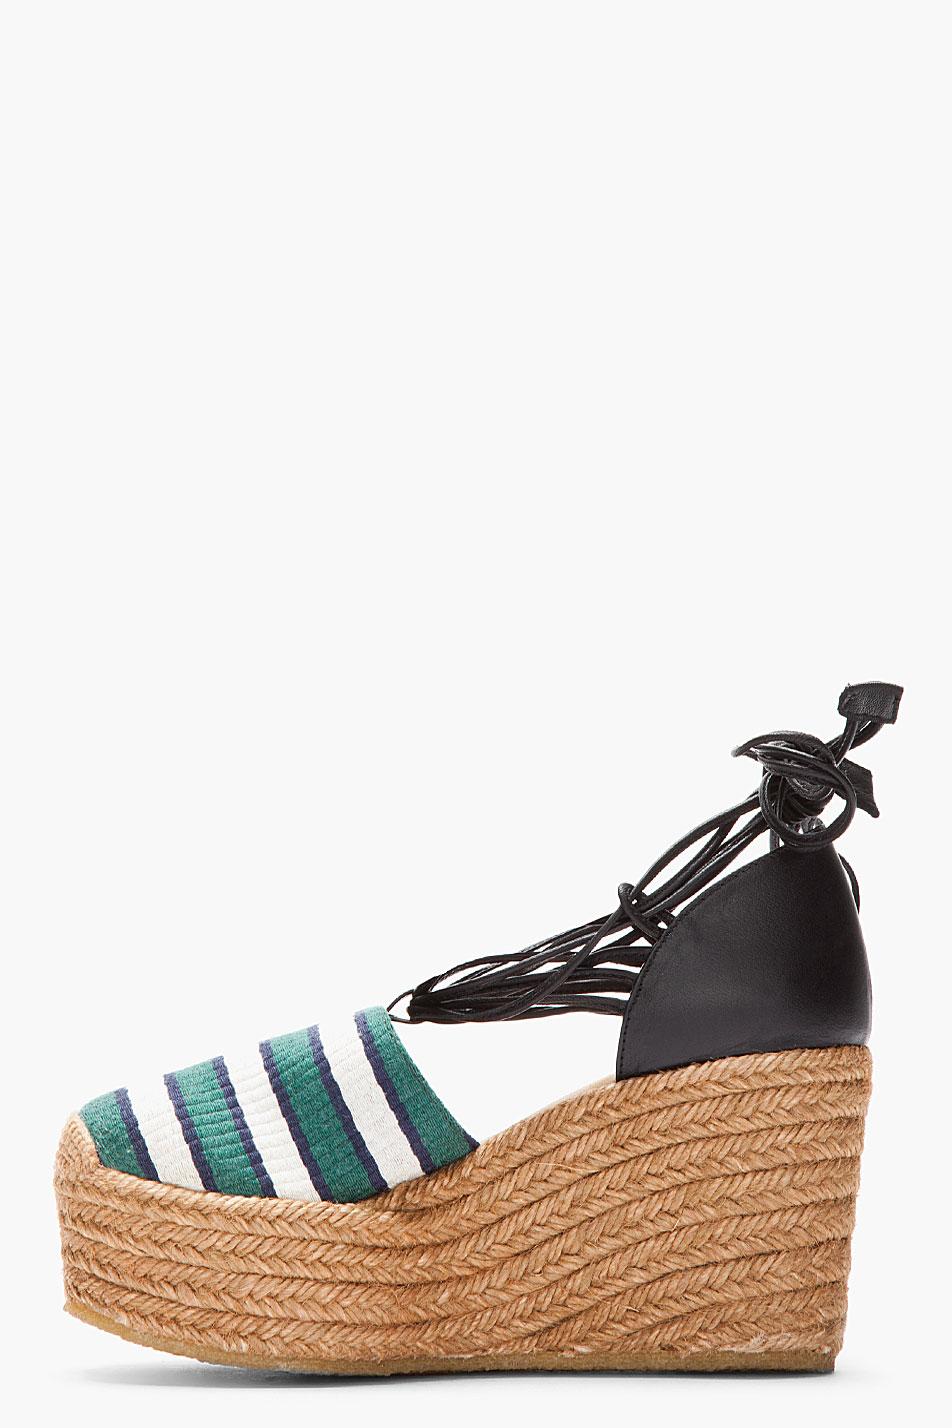 Chlo 233 Green Striped High Wedge Espadrille Heels In Green